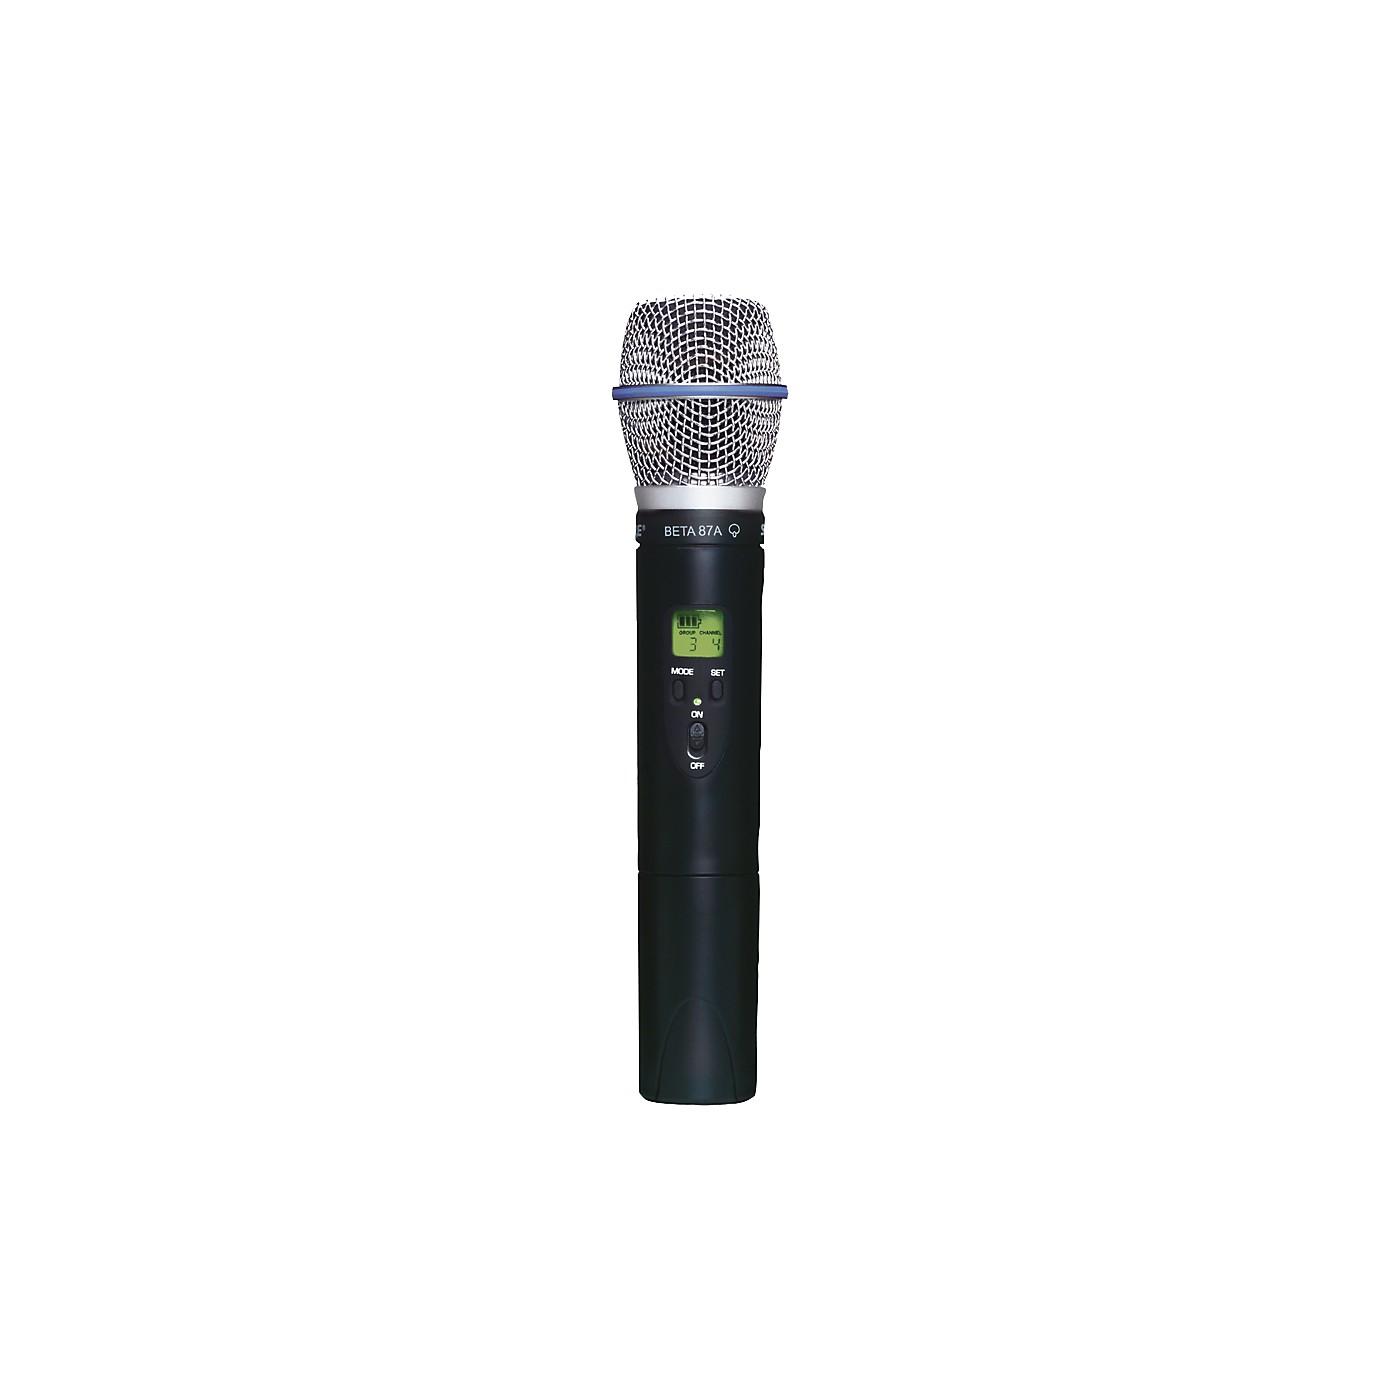 Shure ULX2/Beta87A Wireless Handheld Transmitter Microphone thumbnail